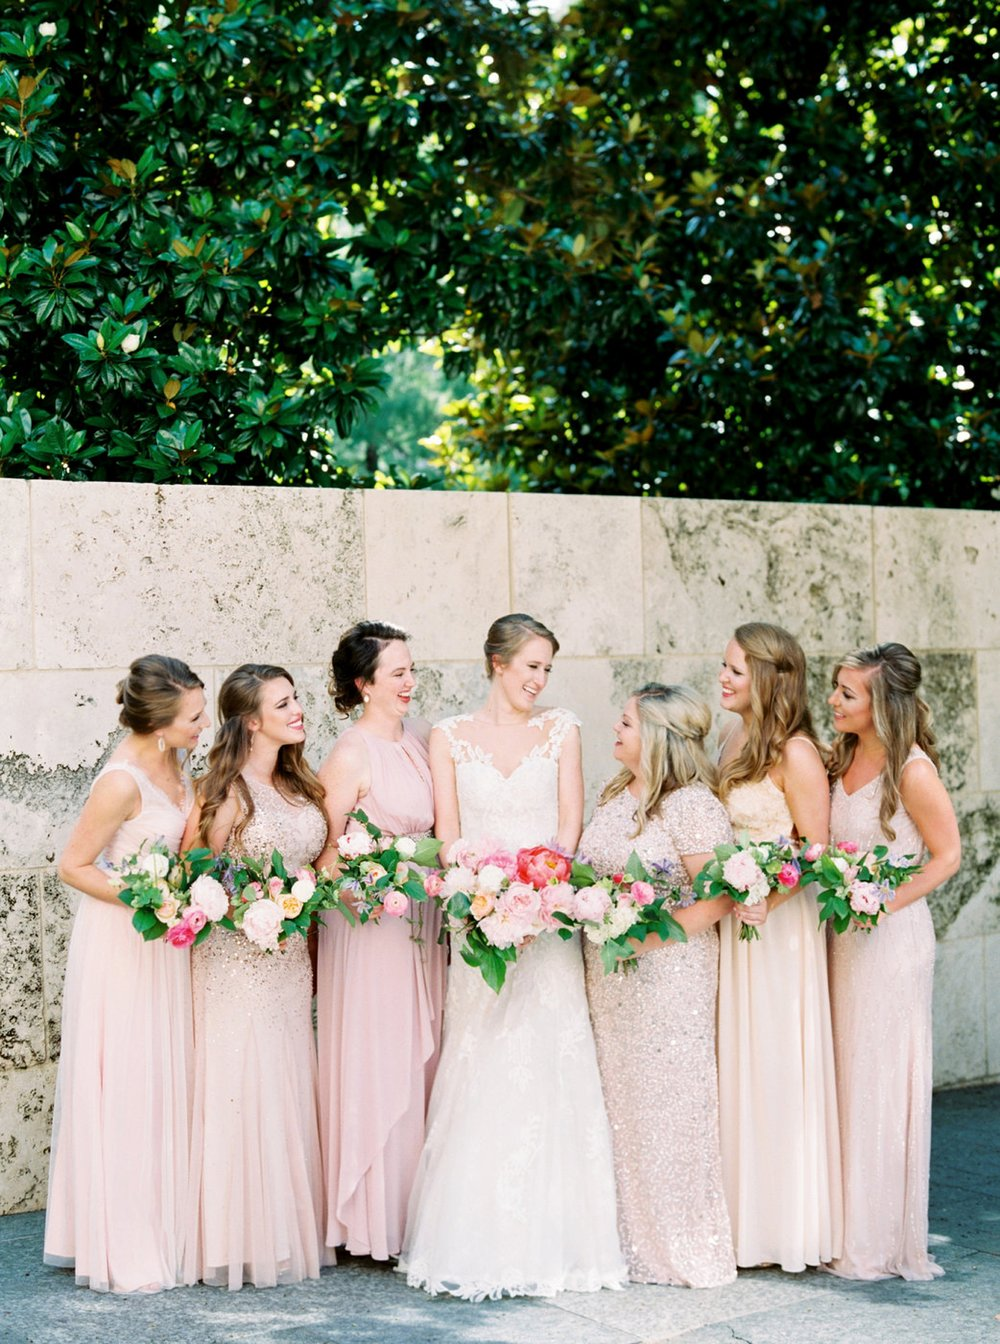 Nasher Sculpture Center Wedding, Mismatched Bridesmaid Dresses, Pink Bridesmaid Dresses, Sequin Bridesmaid Dresses,